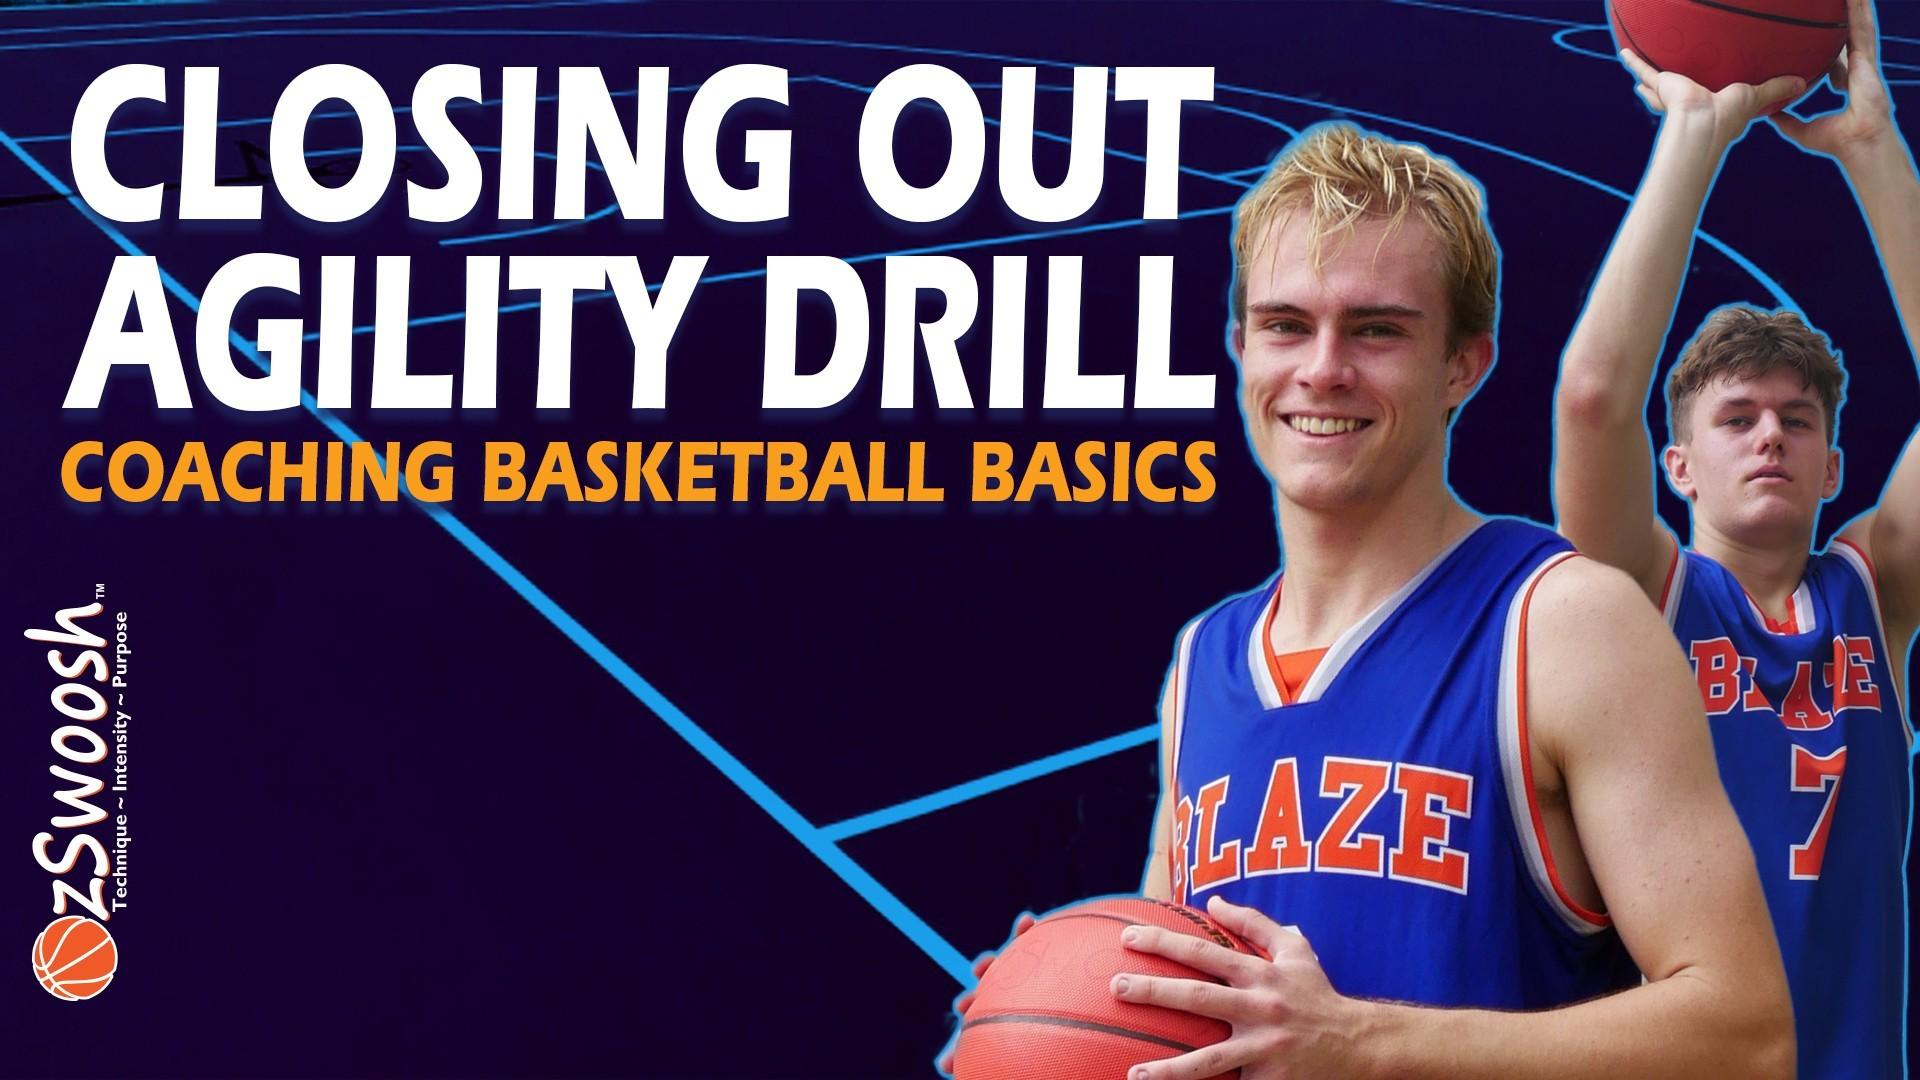 Basketball Close Out Agility Drill - Coaching Basketball Fundamentals